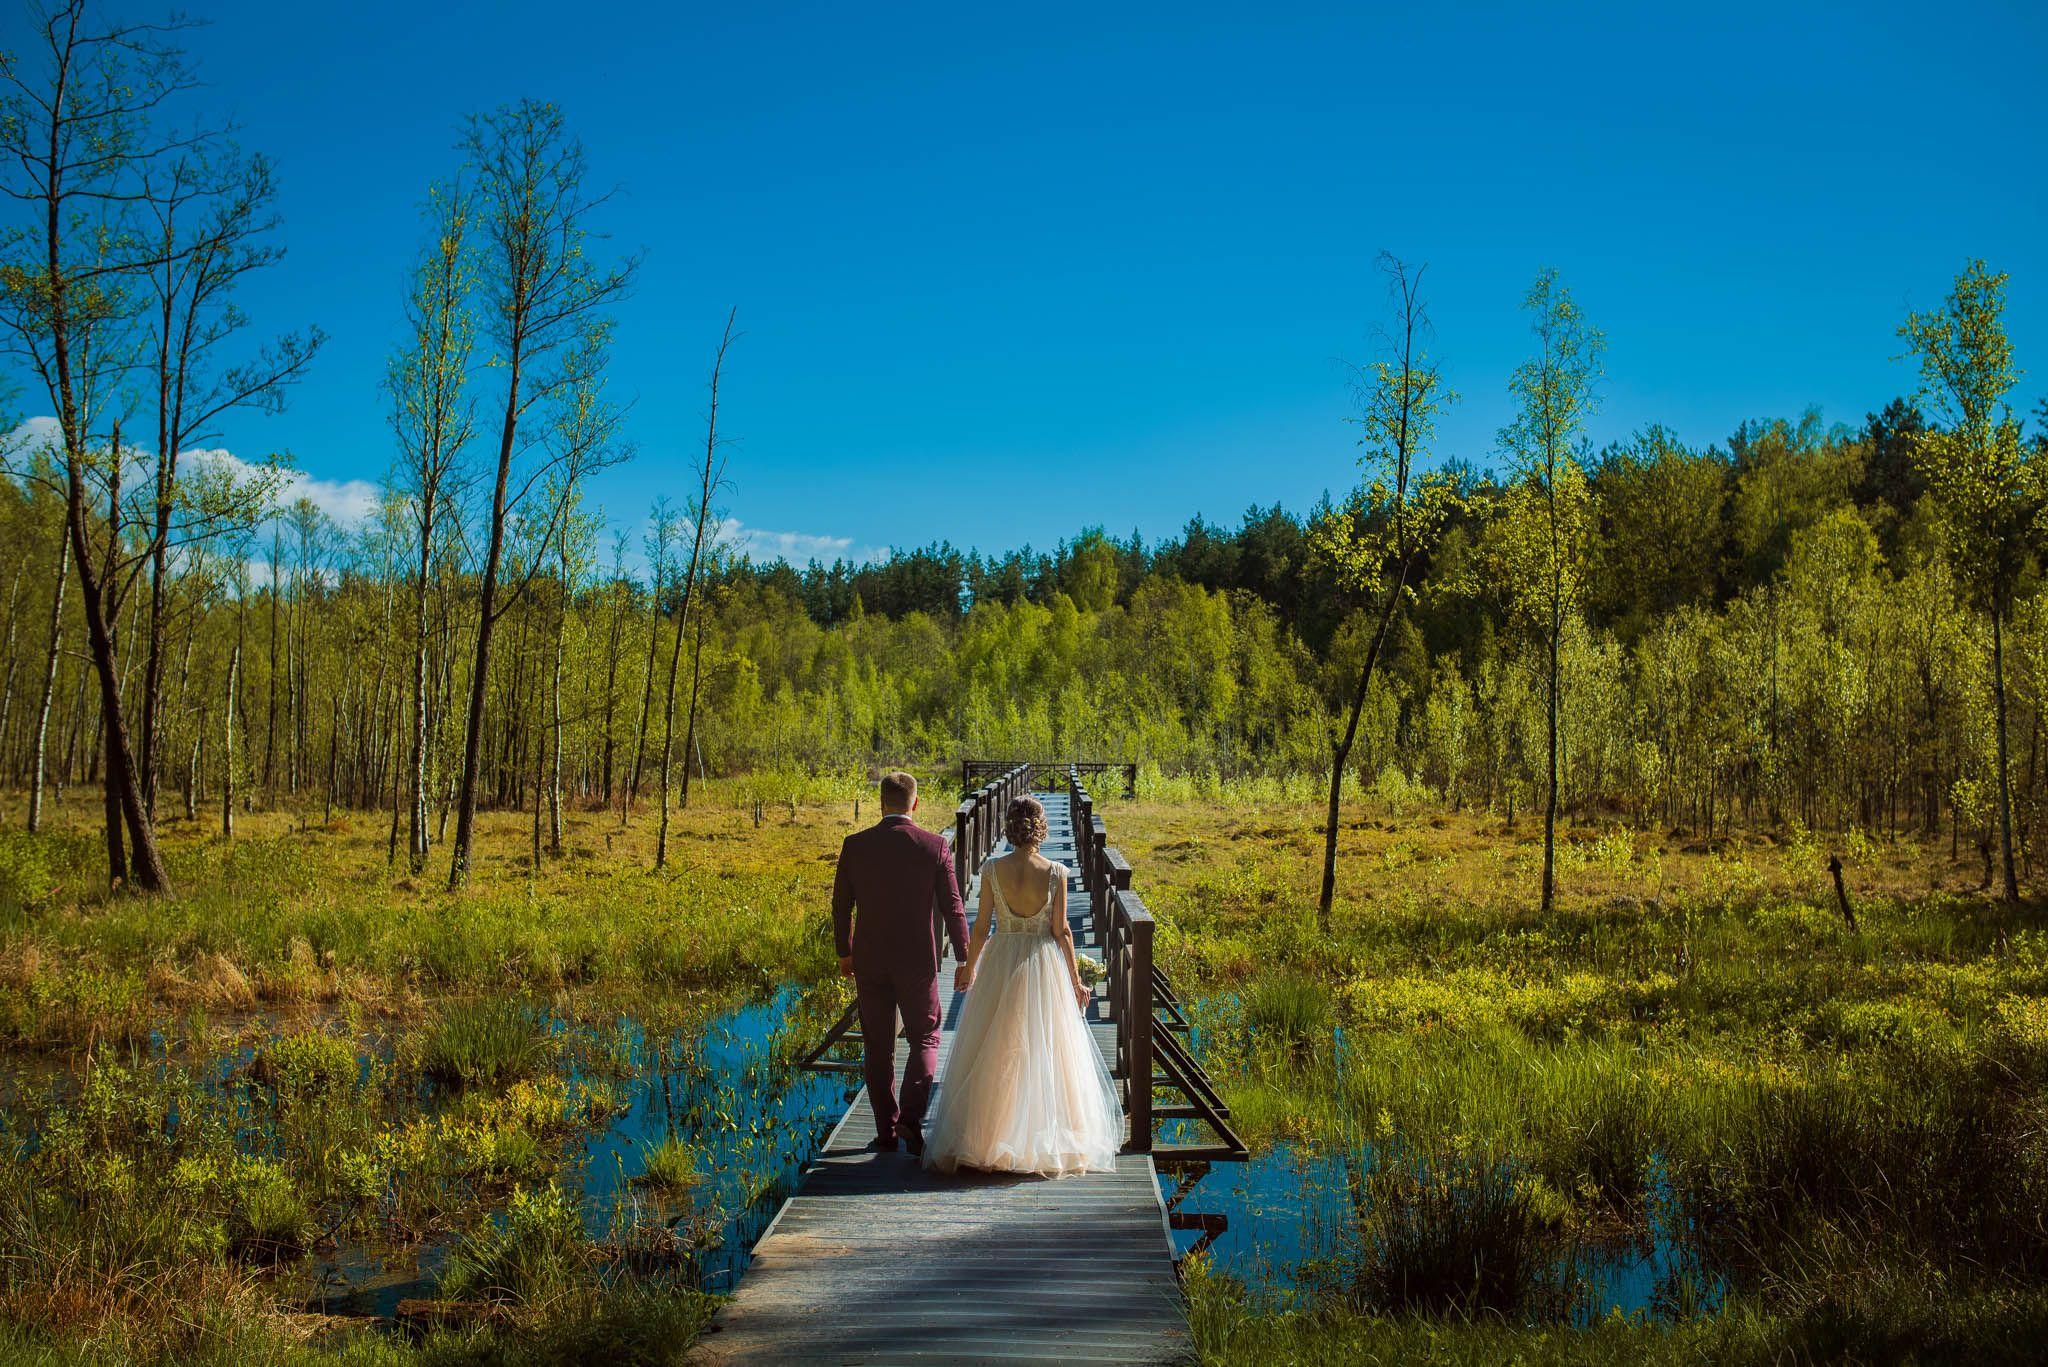 Vestuves prie Dusios